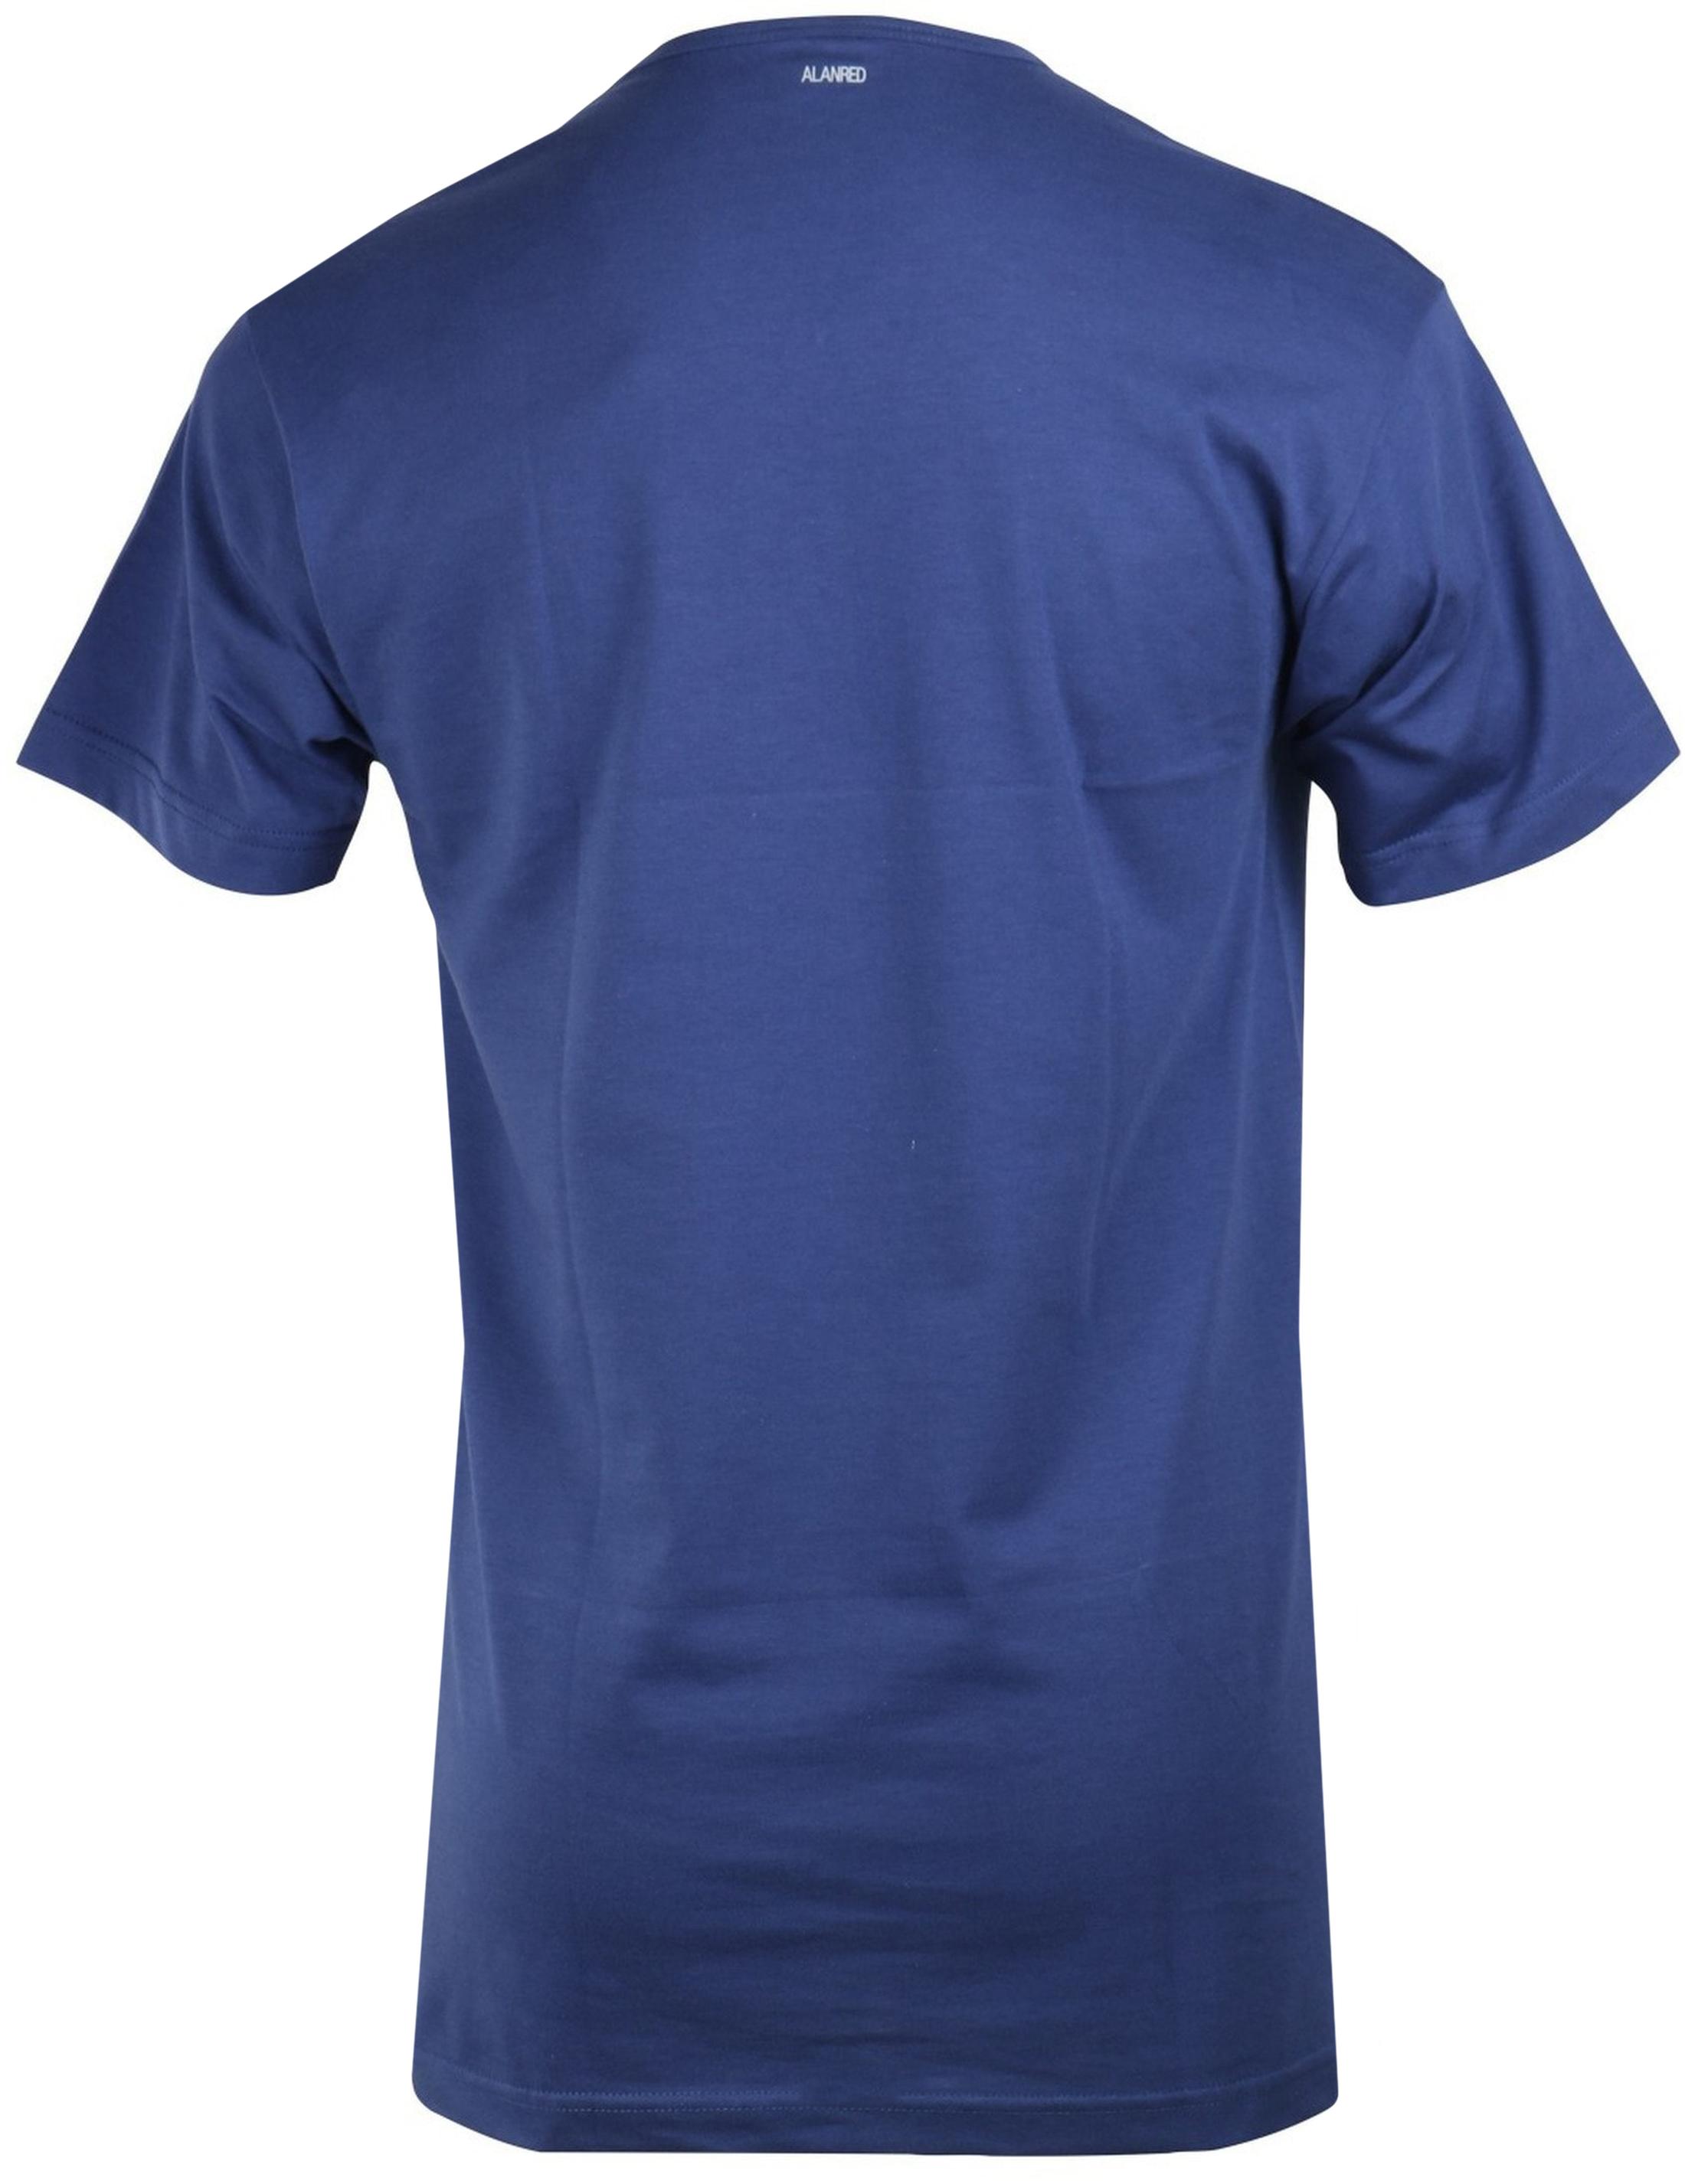 Alan Red Vermont T-Shirt V-Hals Ultramarine (1Pack) foto 2